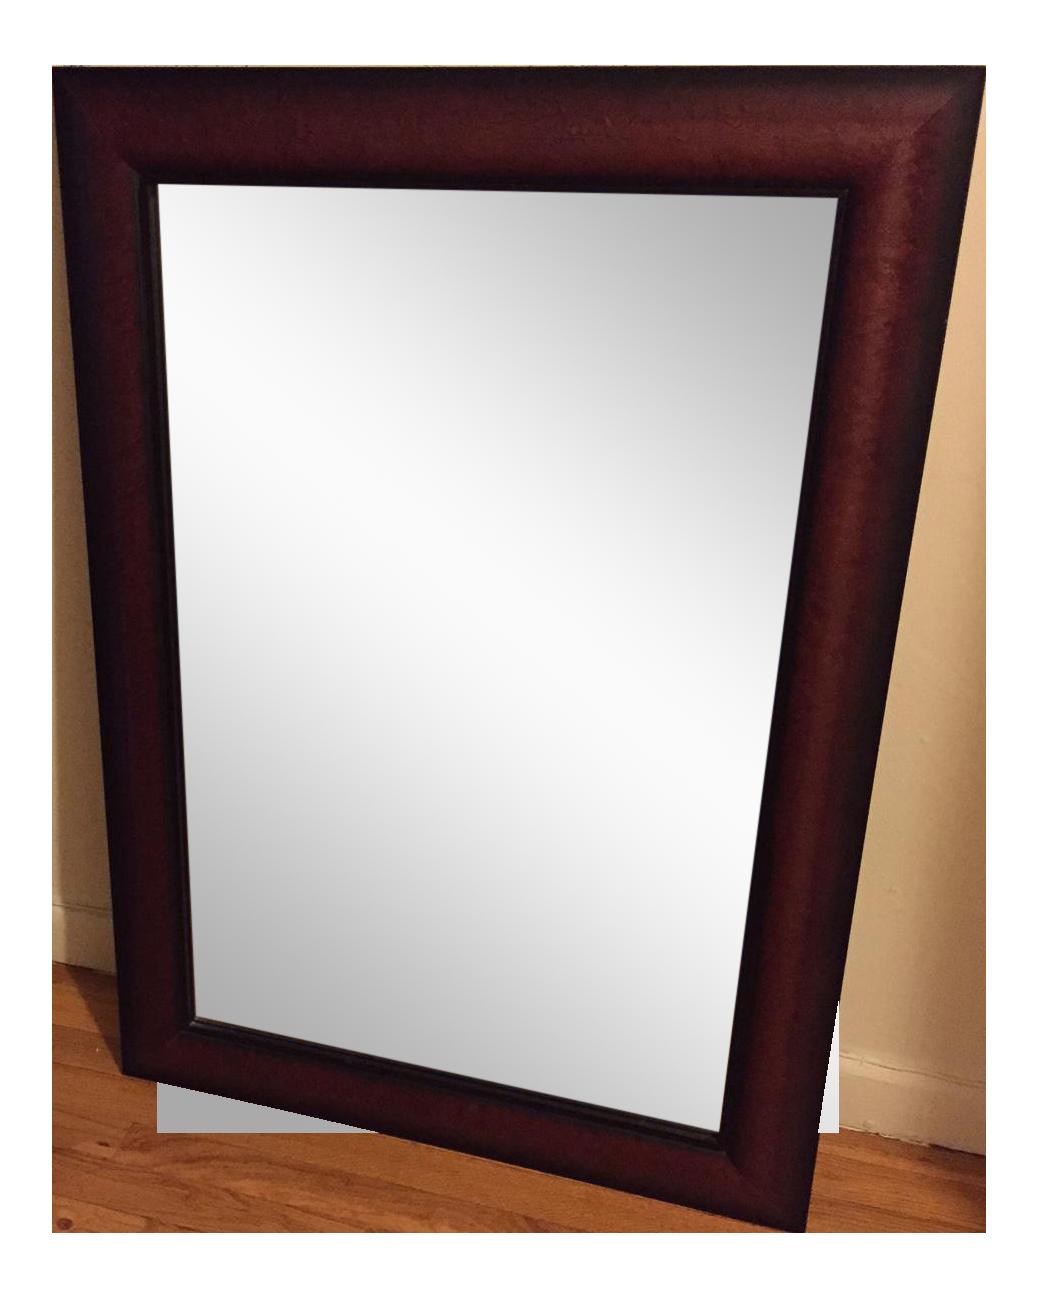 Cherry Wood Framed Rectangular Wall Mirror : Chairish